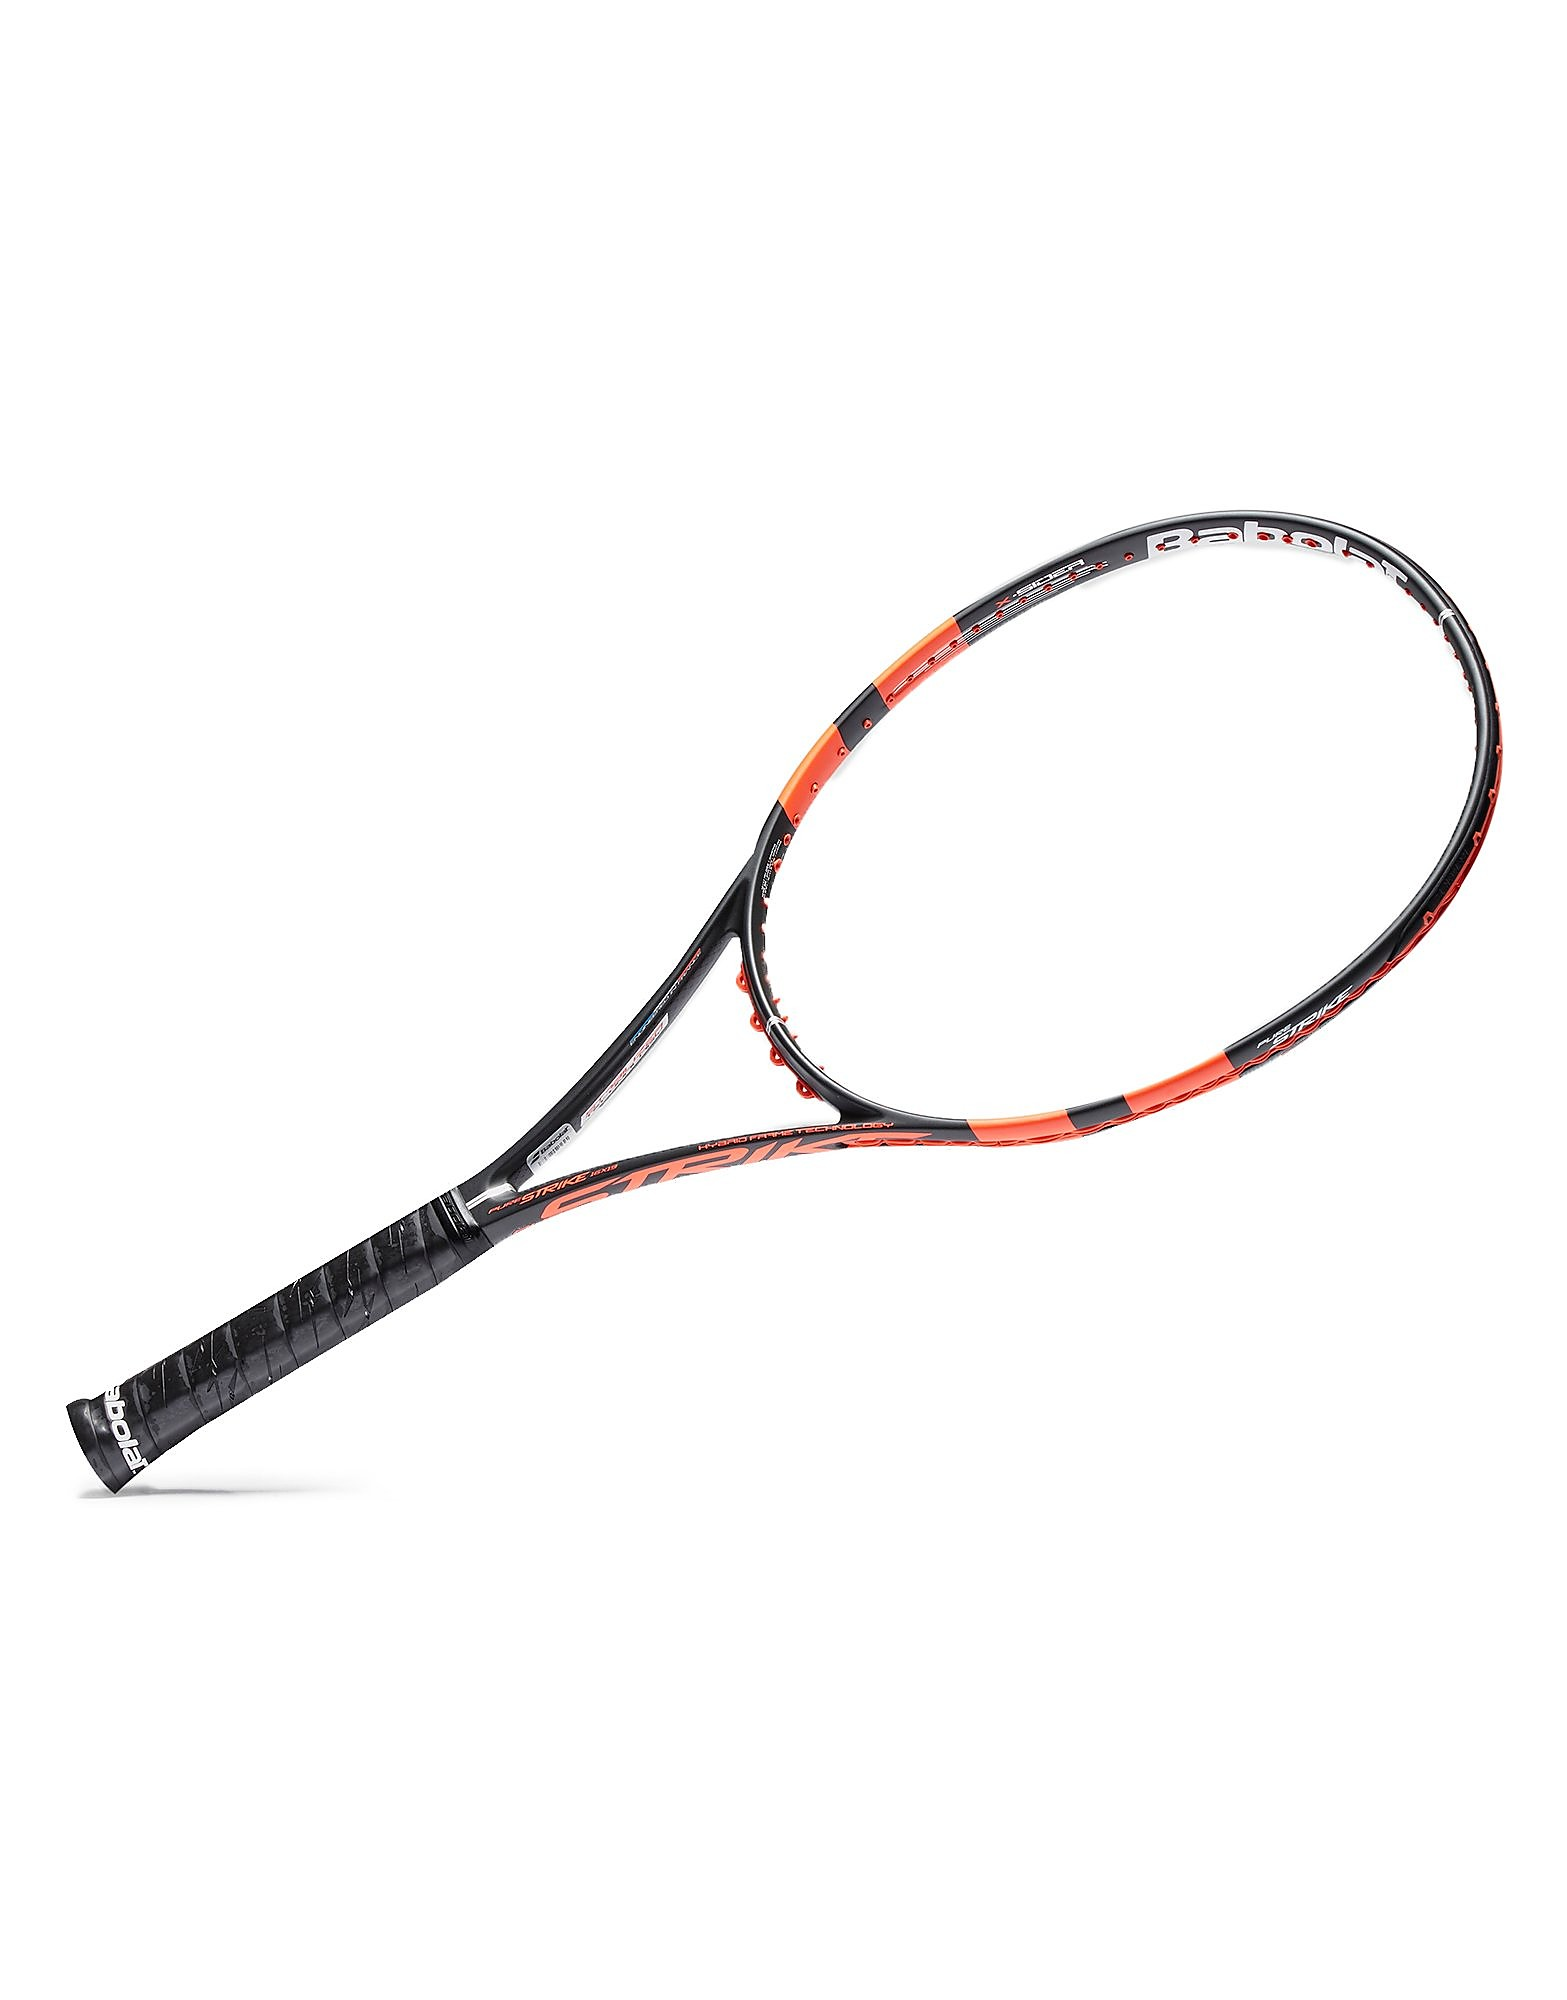 Babolat Pure Strike 16/19 Tennis Racket